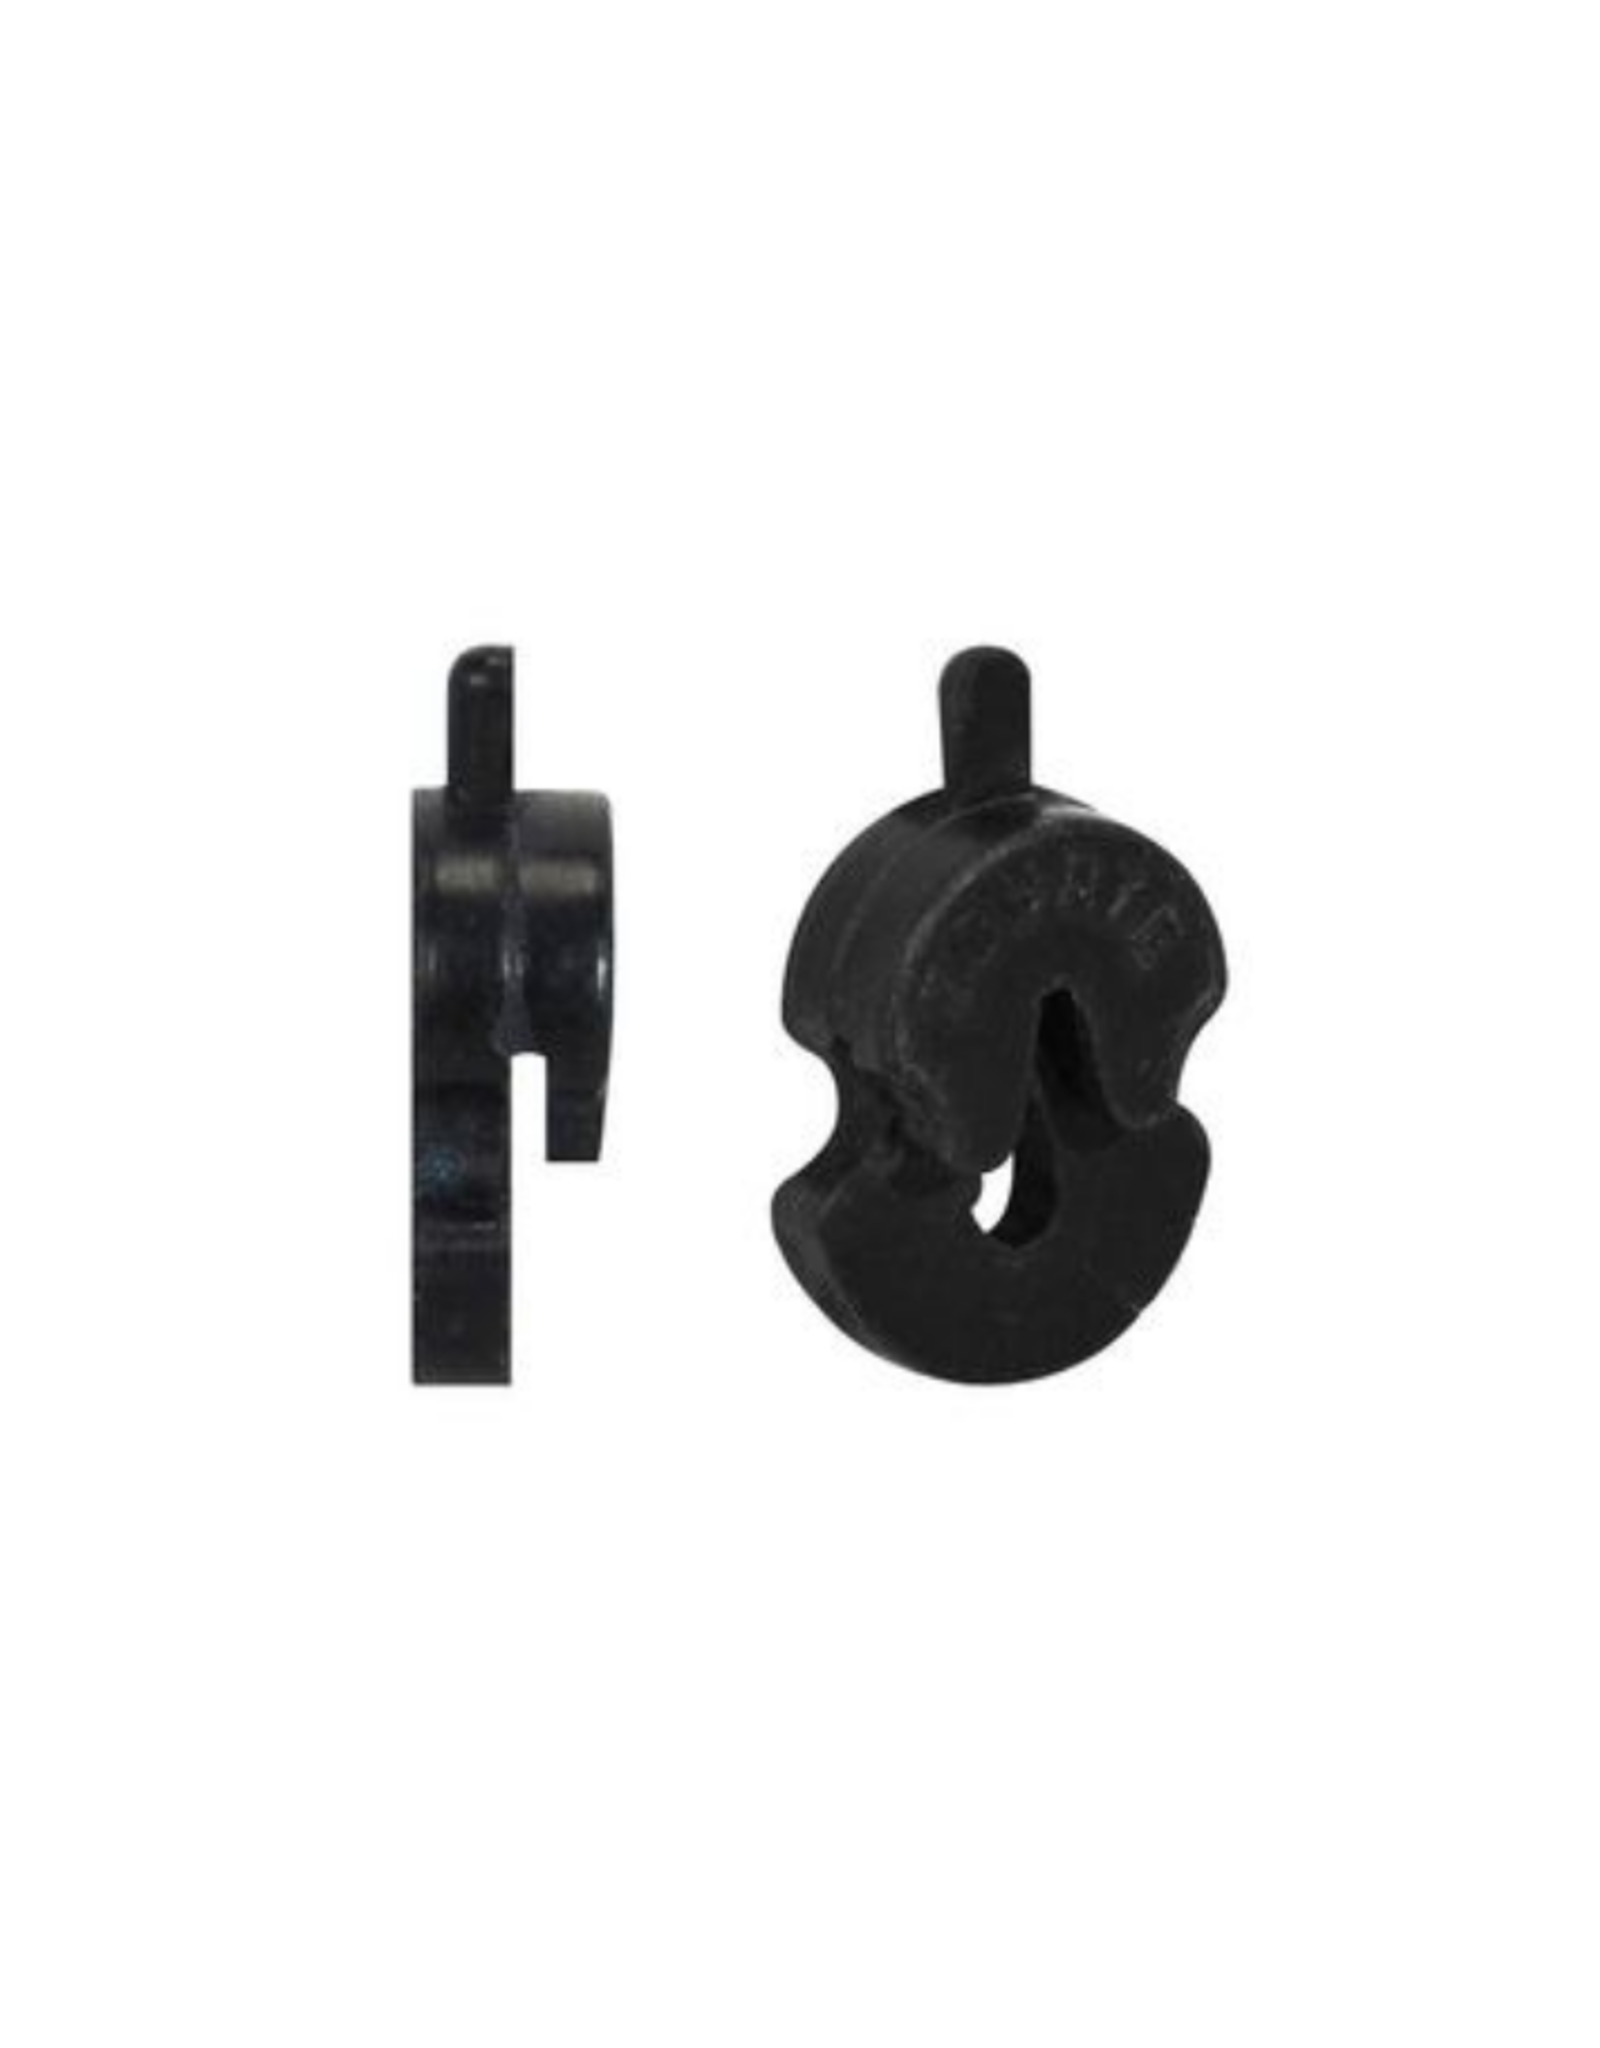 Altviool demper, vioolvormig model, rubber